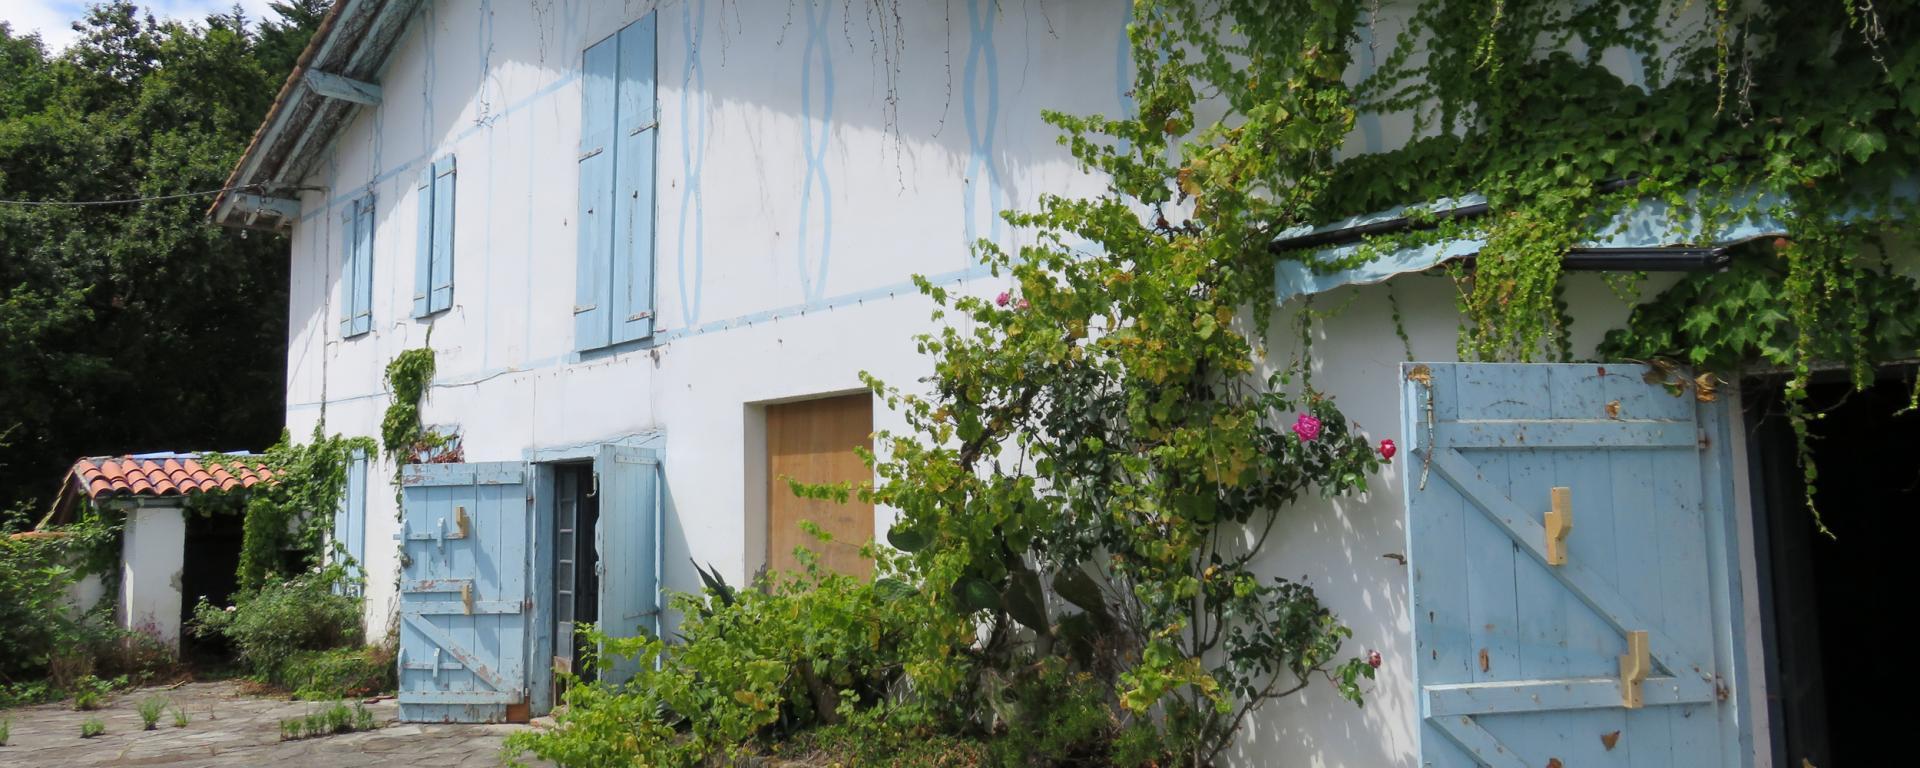 Maison Katalinkoenea dans le domaine d'Abbadia - Hendaye [64]